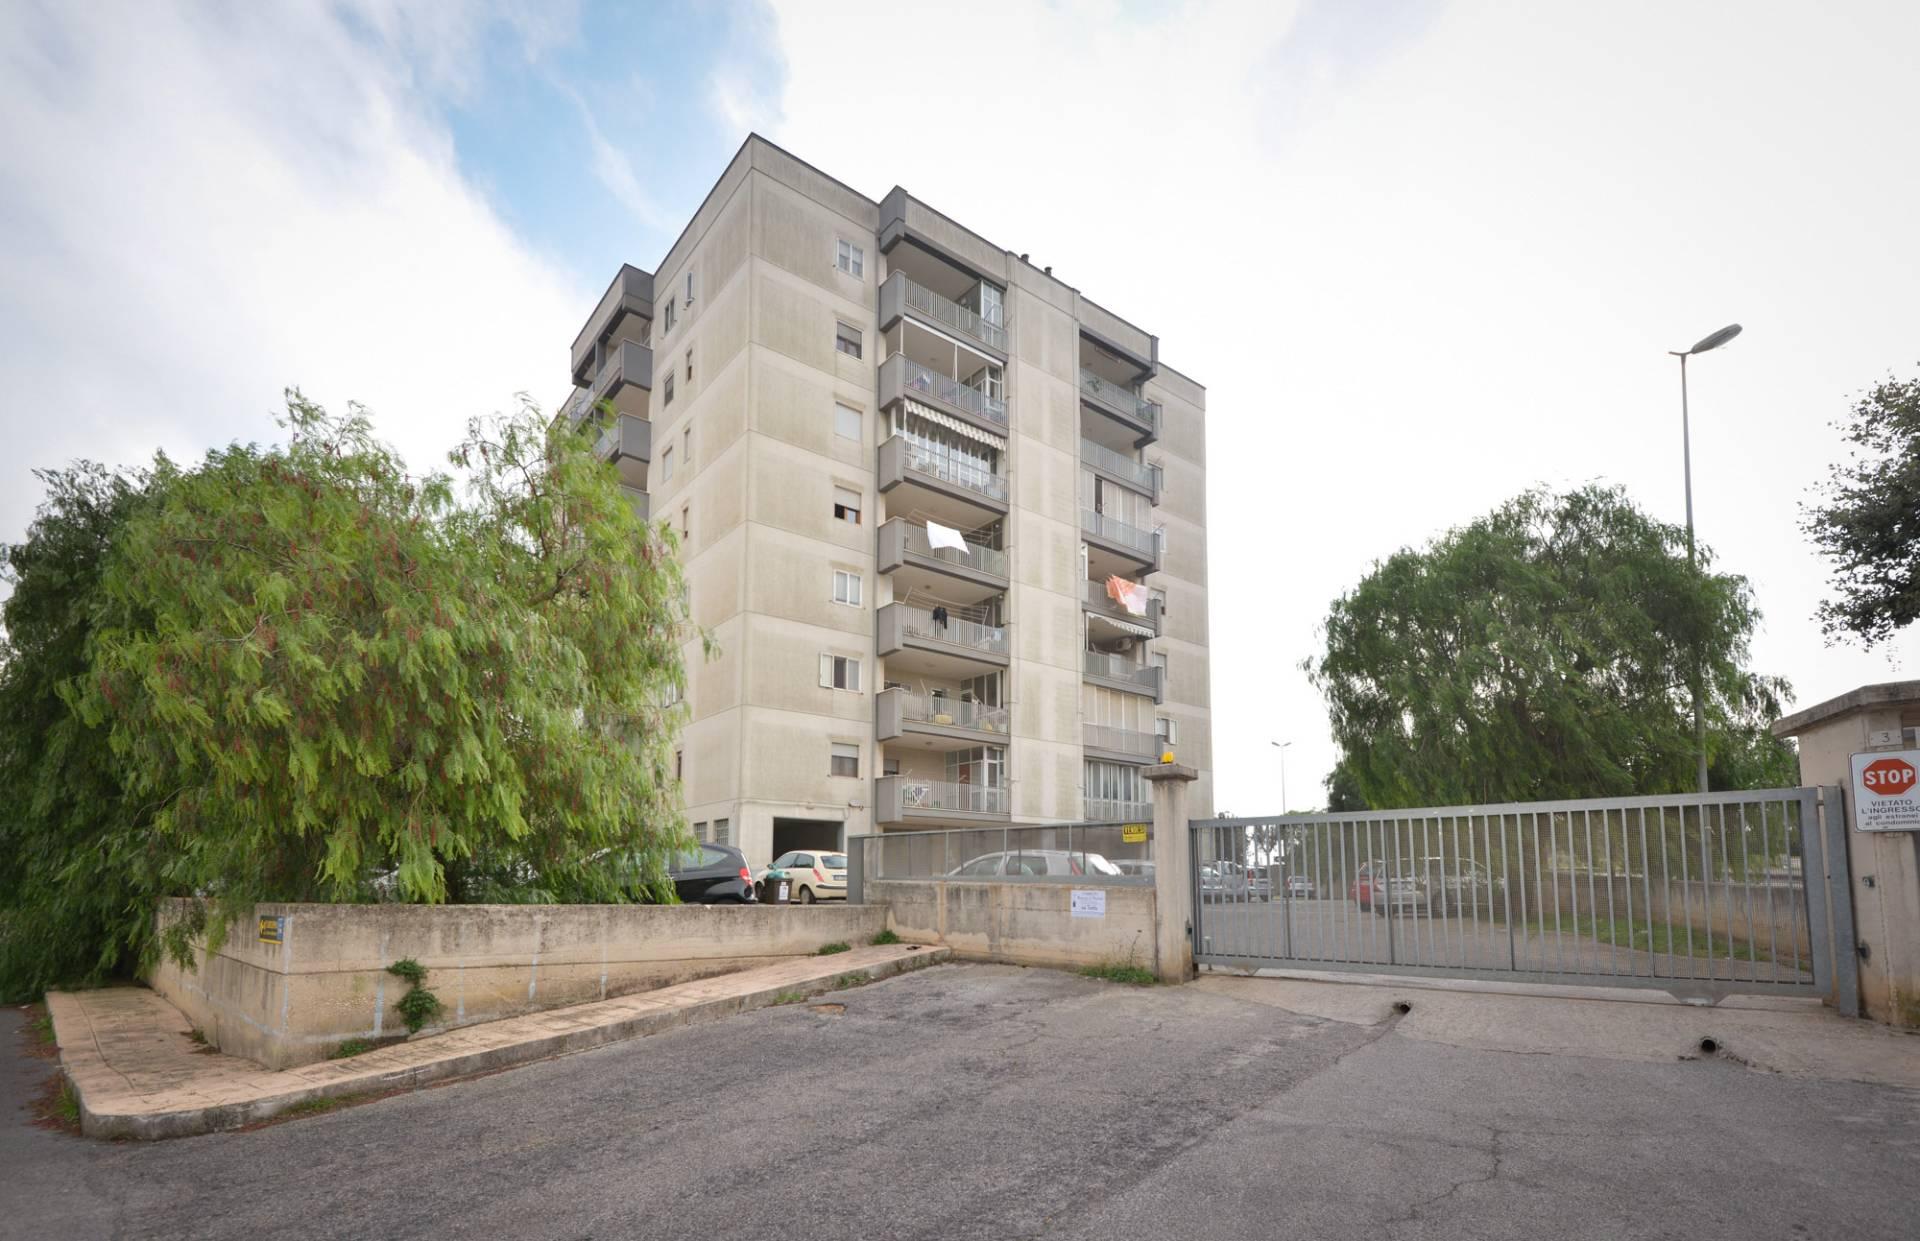 Appartamento in vendita a Ostuni, 4 locali, Trattative riservate | CambioCasa.it